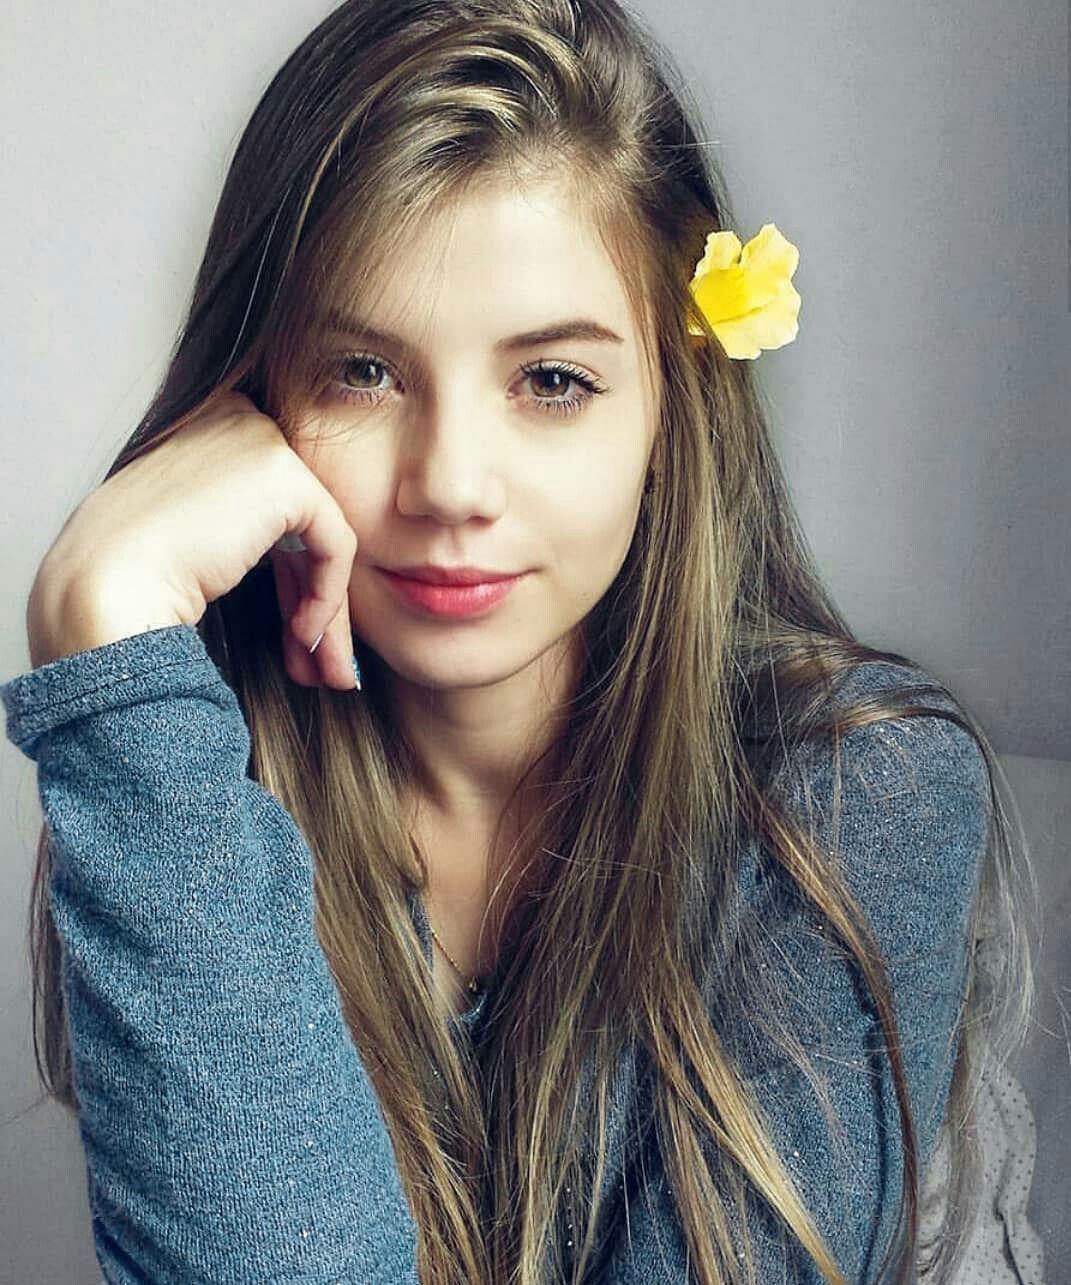 Selfie Snezhana Yanchenko nudes (36 photo), Pussy, Paparazzi, Twitter, cameltoe 2006